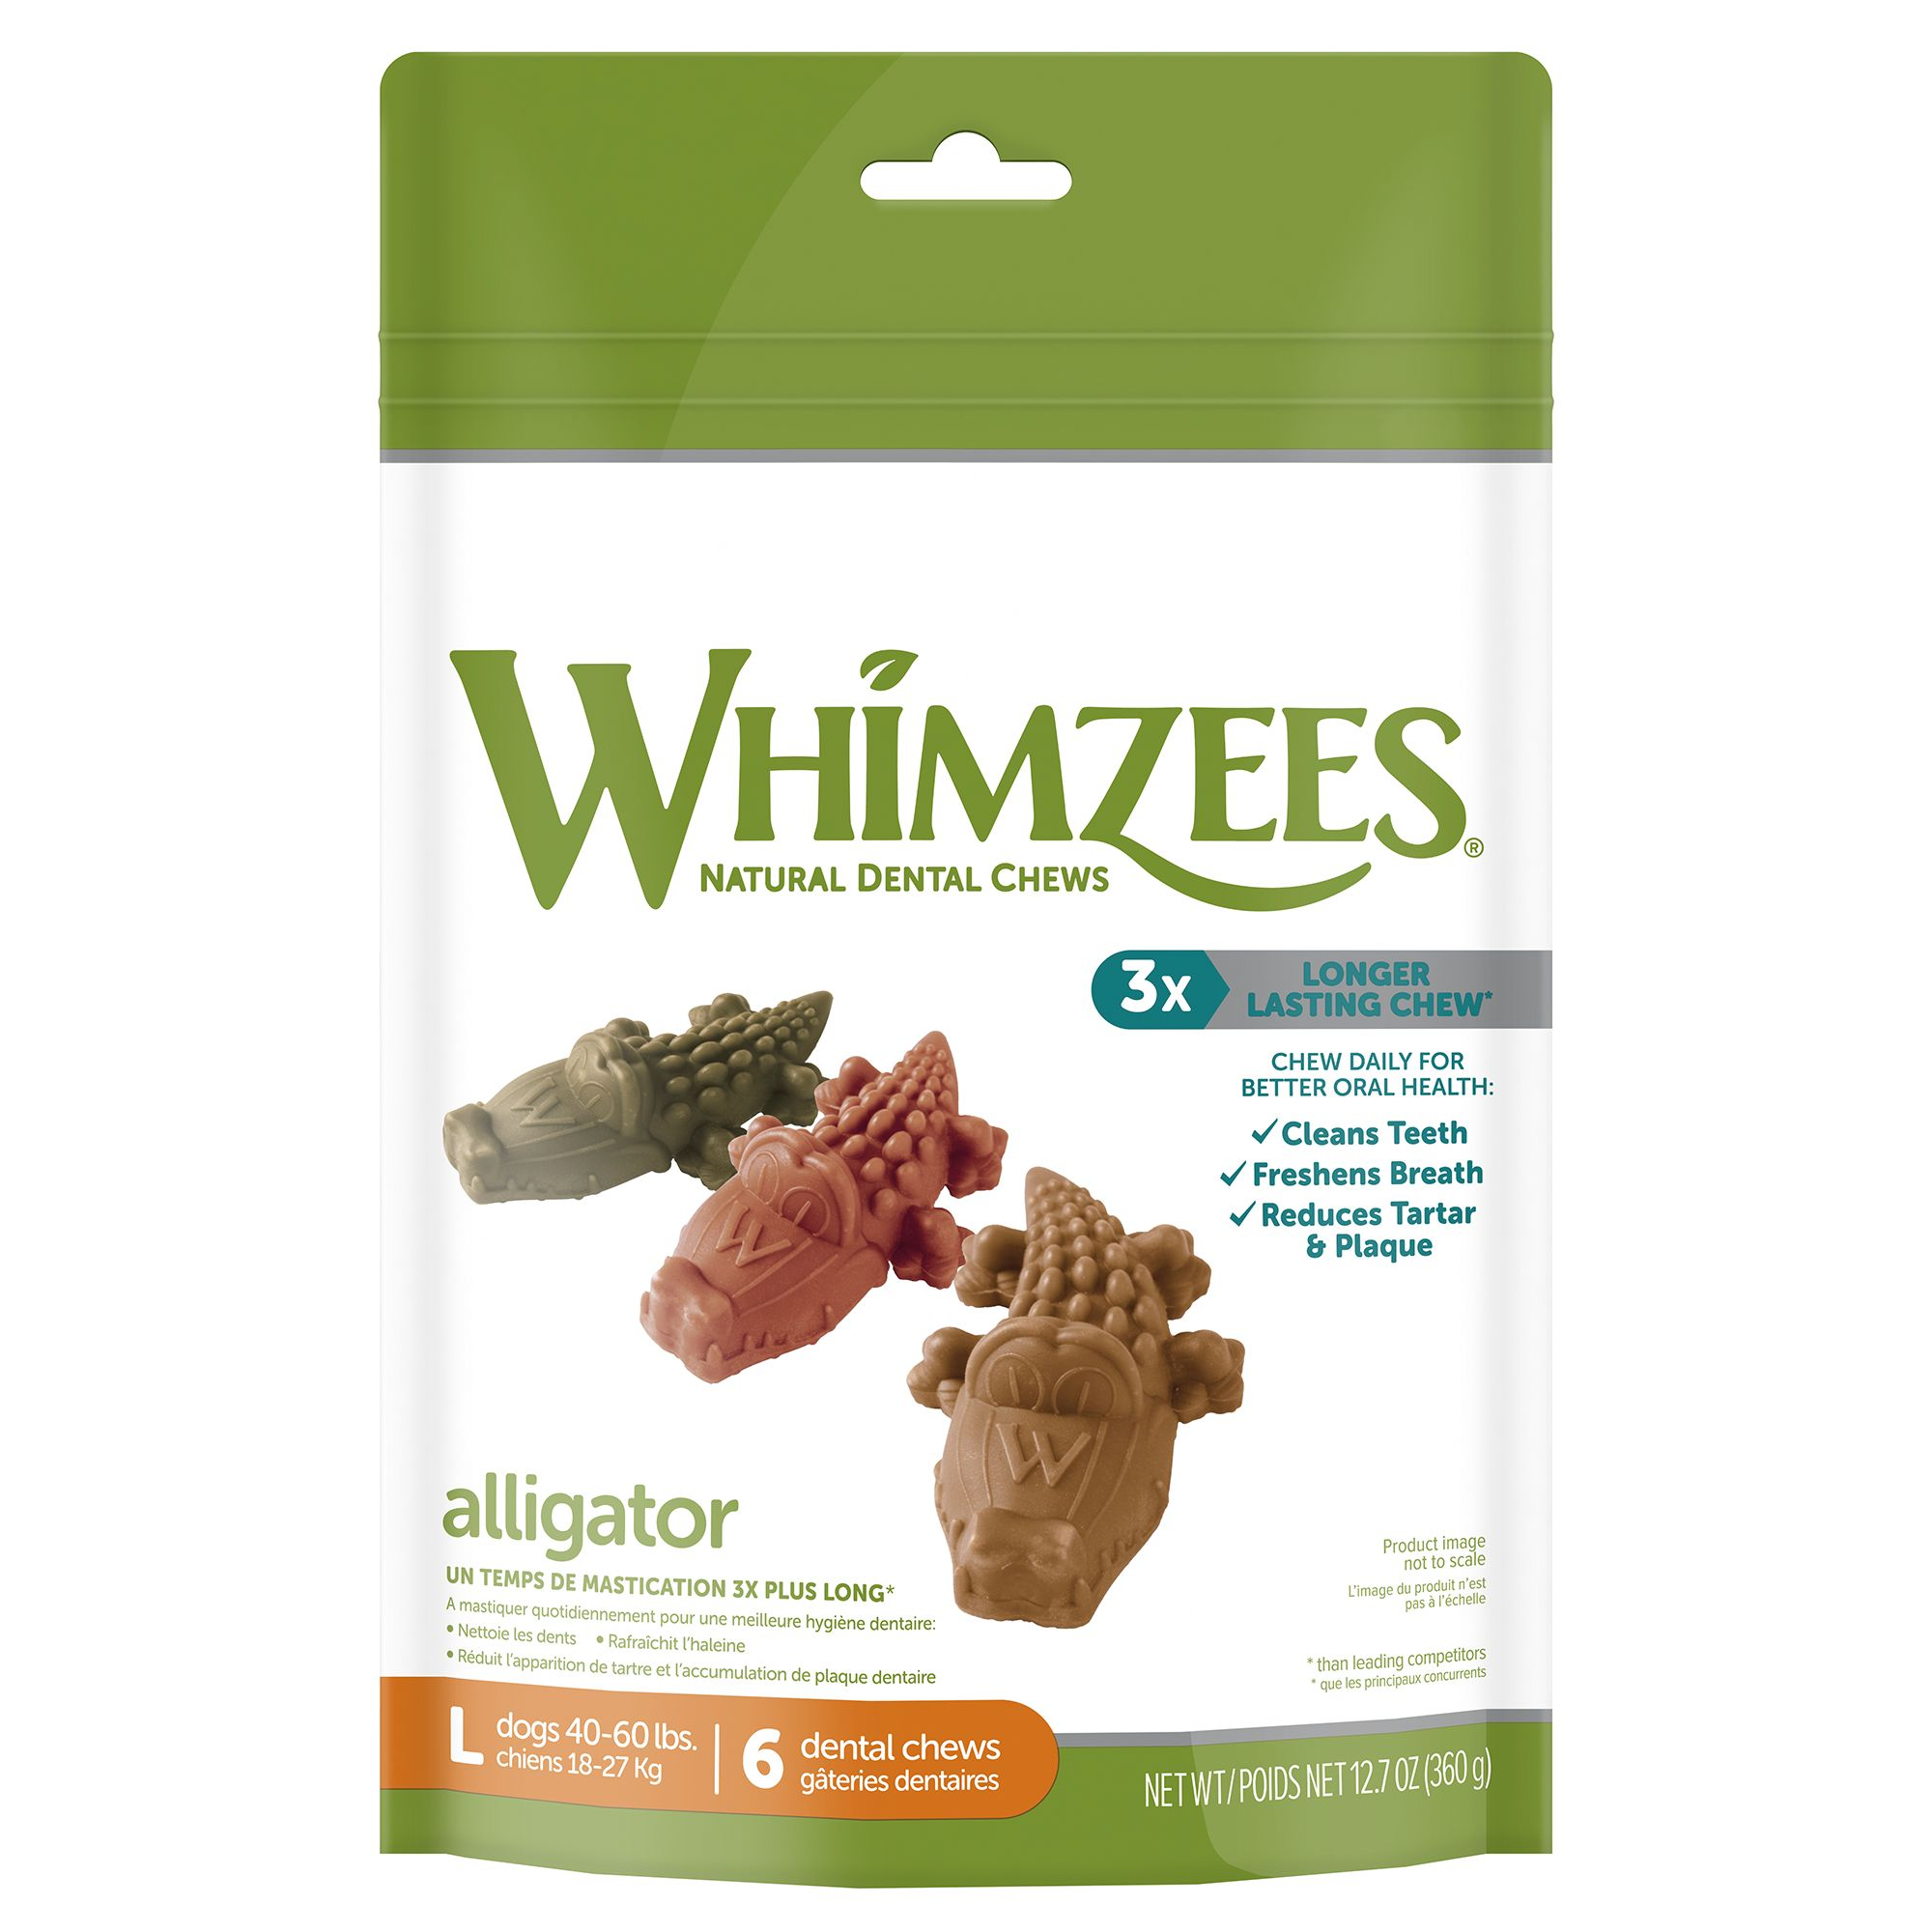 Whimzees Dental Care Alligator Large Dog Treat Natural Gluten Free Vegetarian Size 6 Count